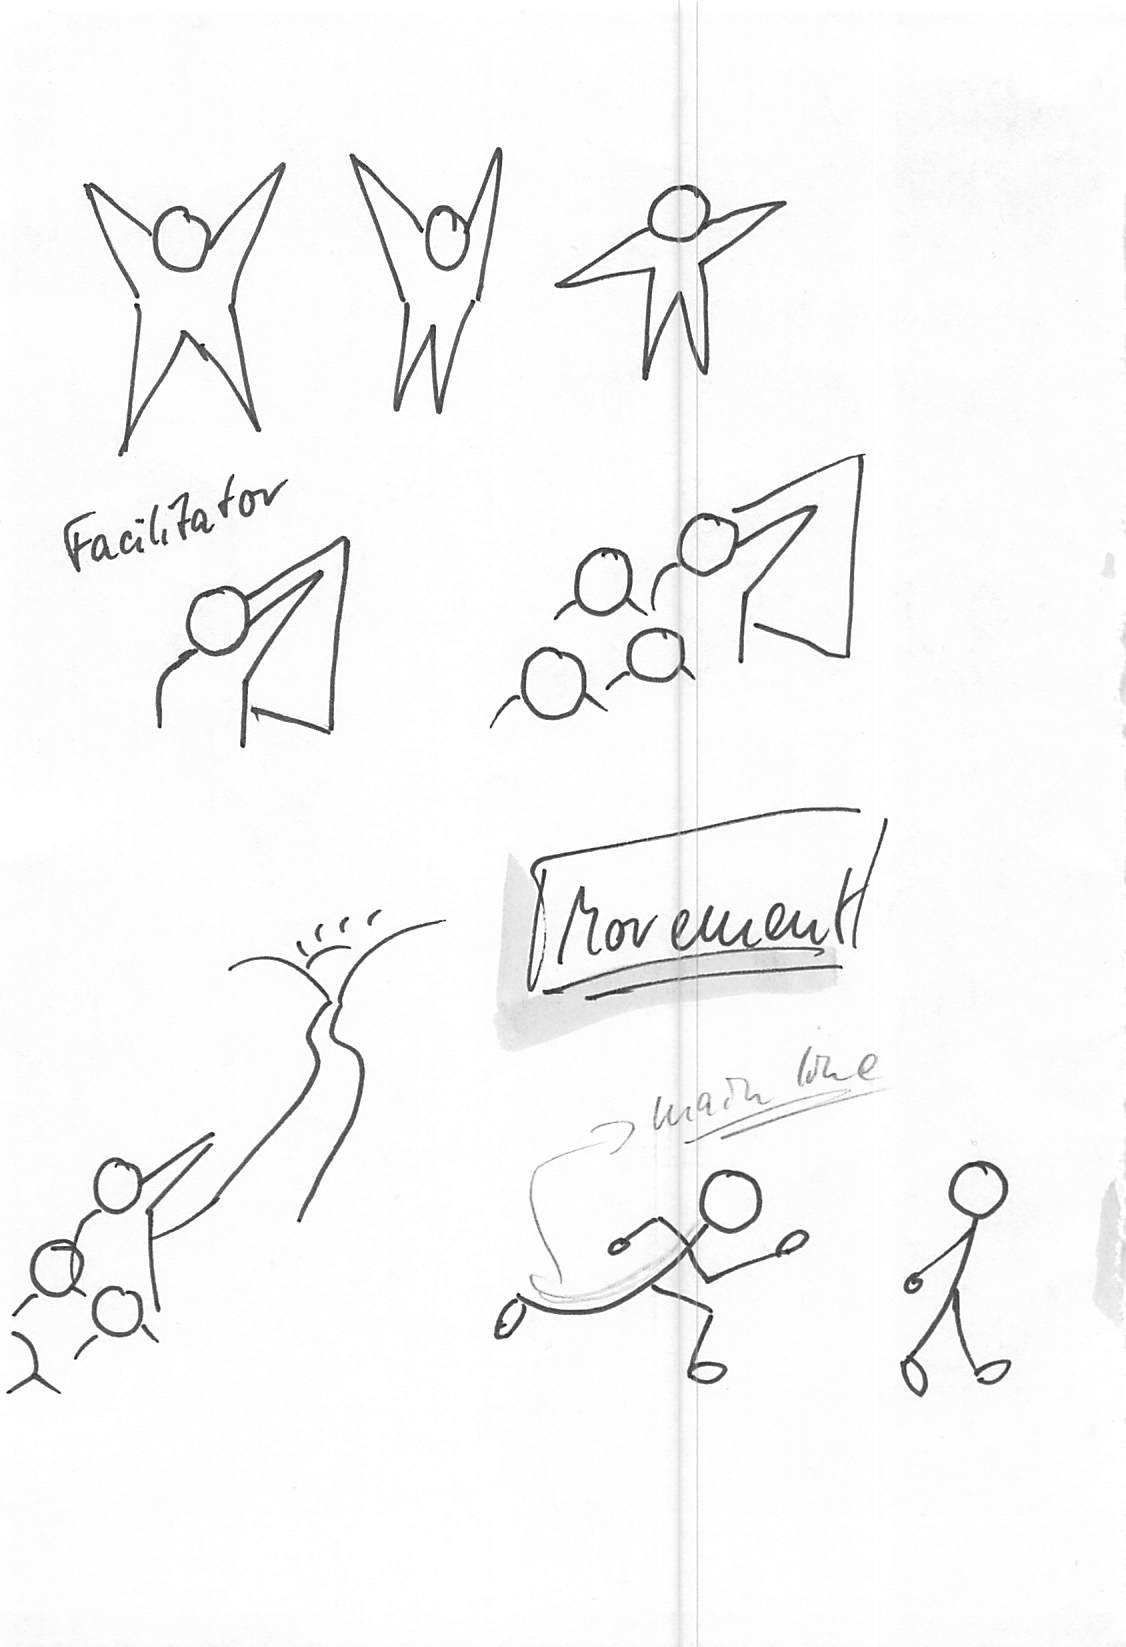 Visual Thinking Skills: Visualization Workshop - Movement